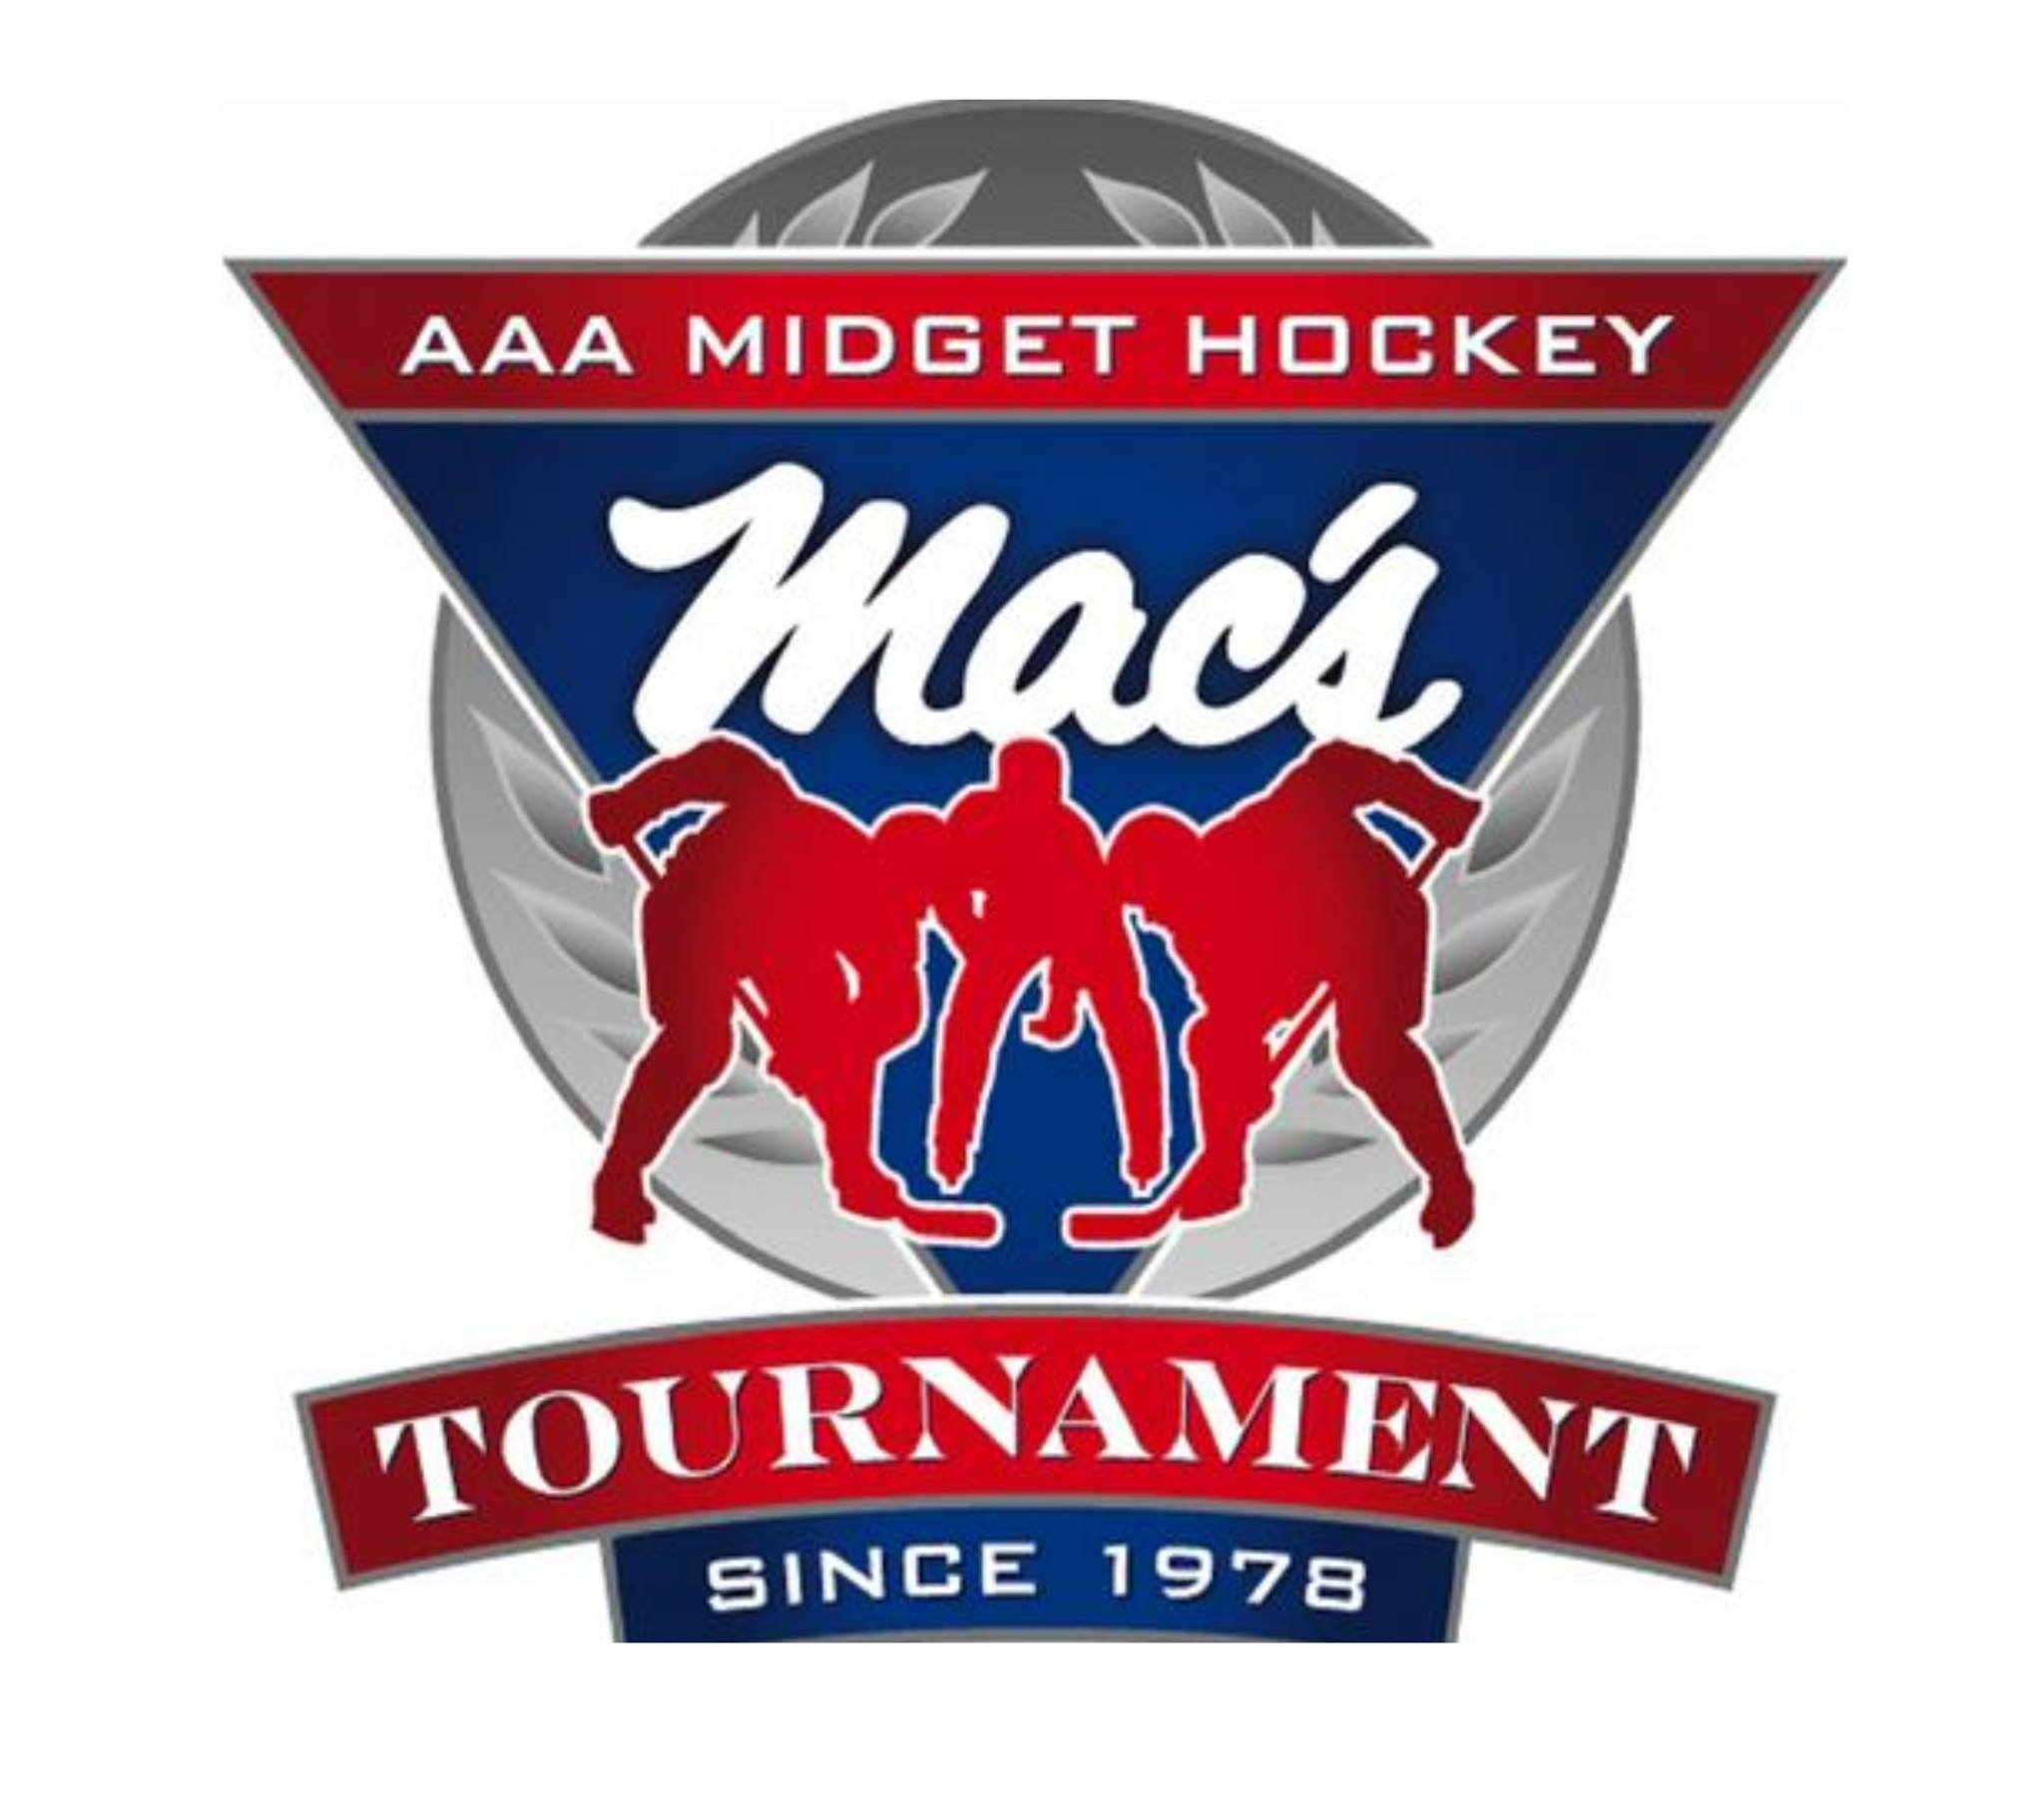 tournament Midget hockey